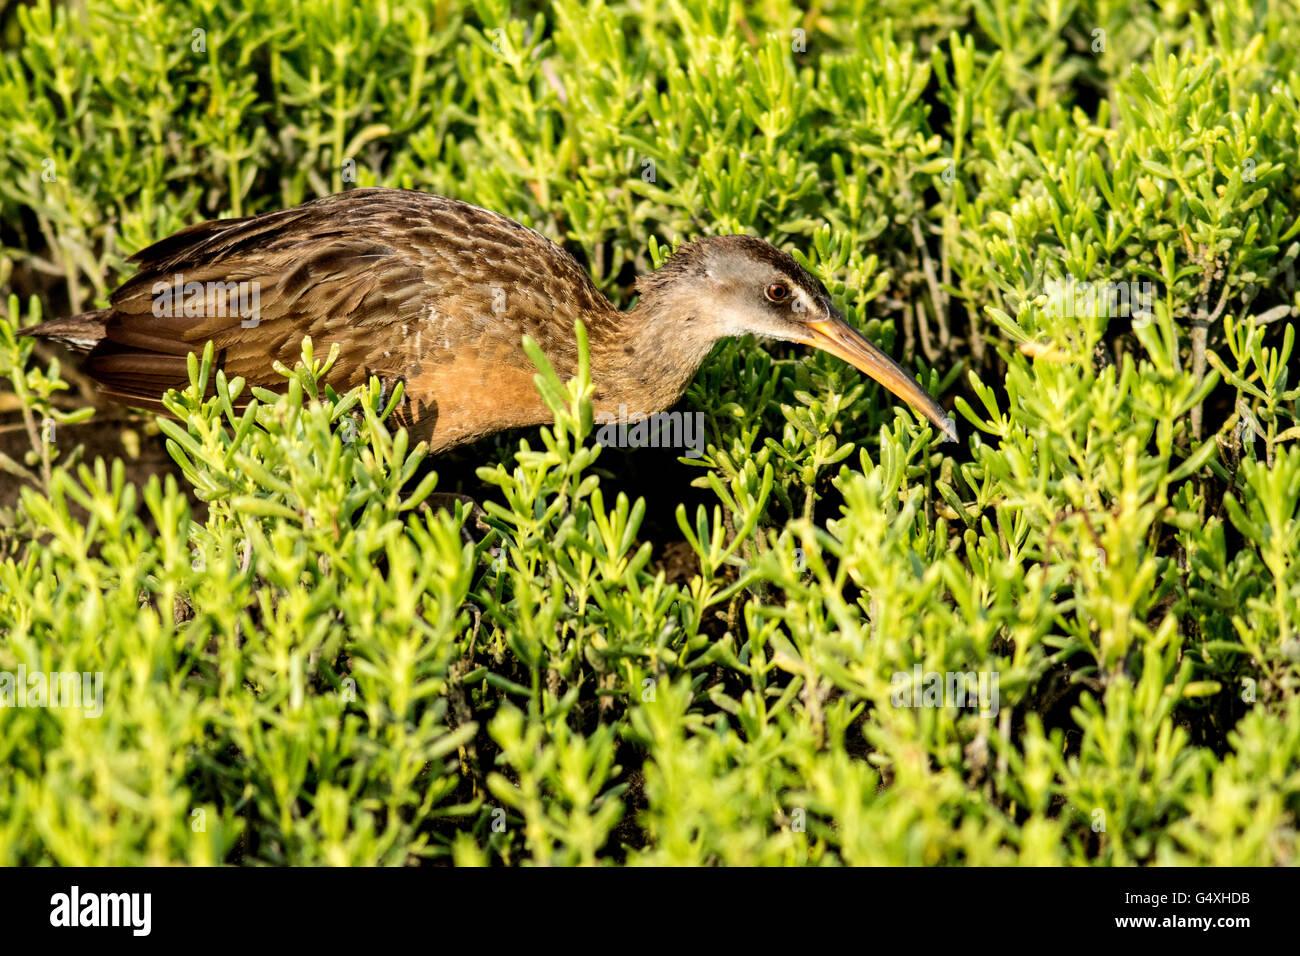 Clapper Rail (Rallus longirostris) - World Birding Center - South Padre Island, Texas USA - Stock Image